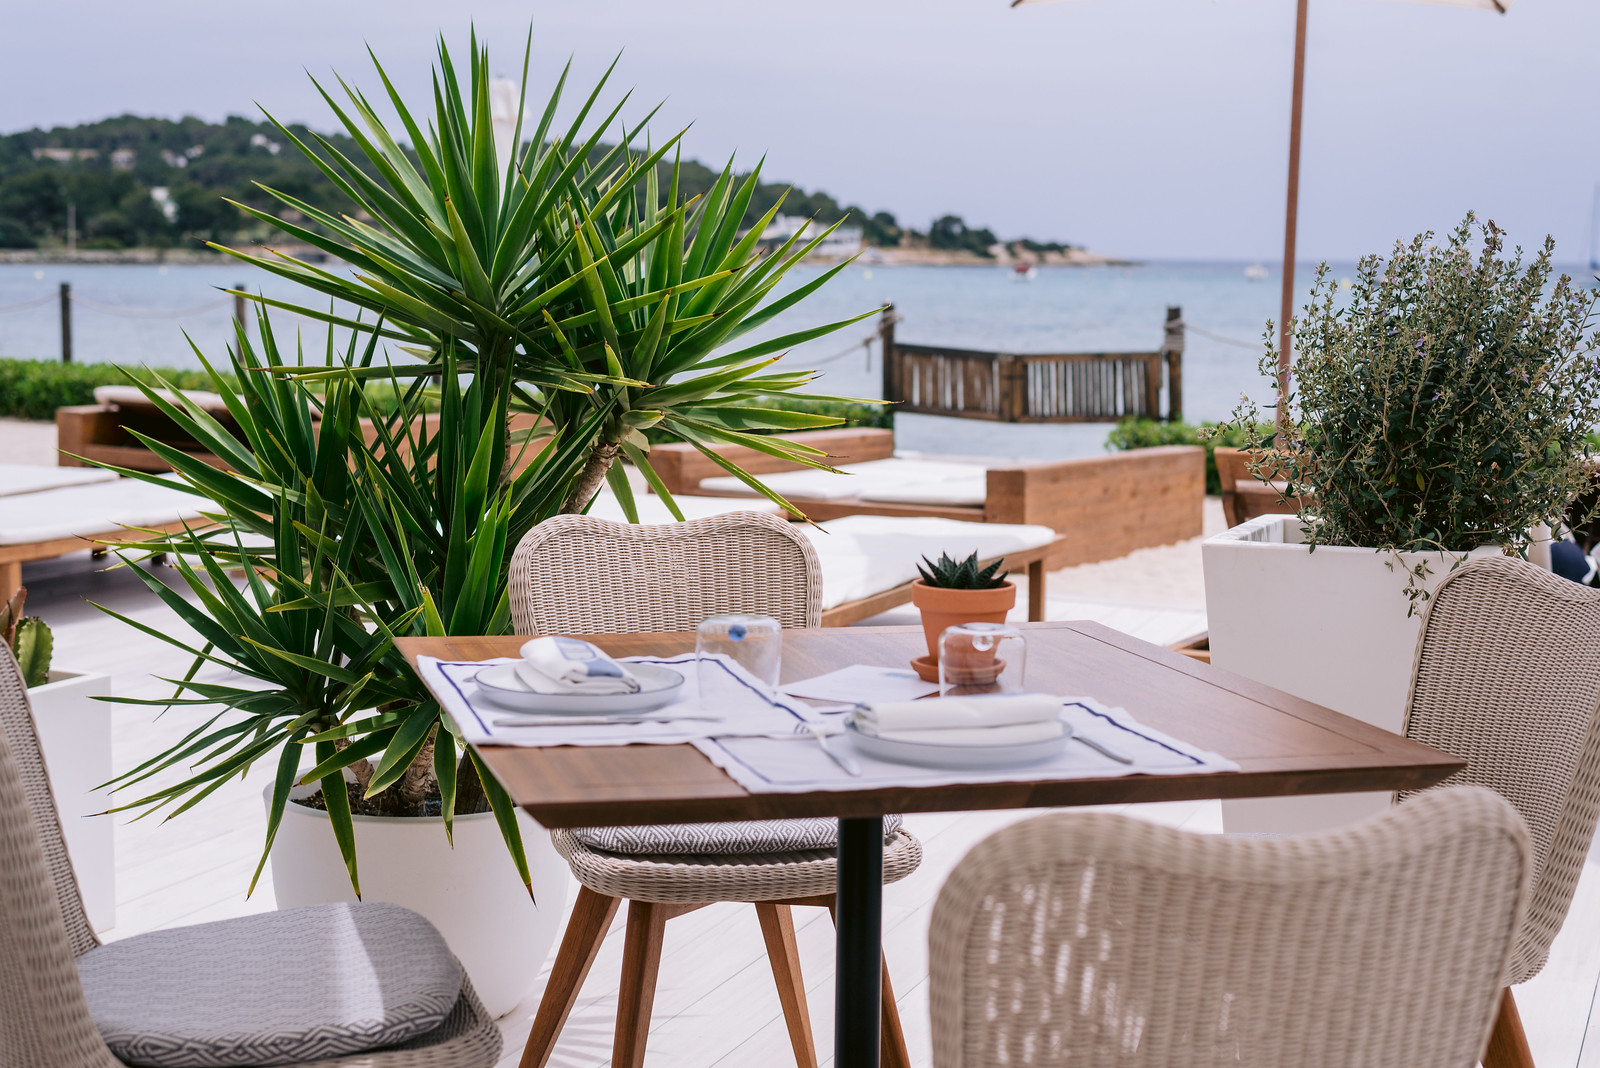 https://www.white-ibiza.com/wp-content/uploads/2021/06/white-ibiza-restaurants-bibo-ibiza-bay-11.jpg